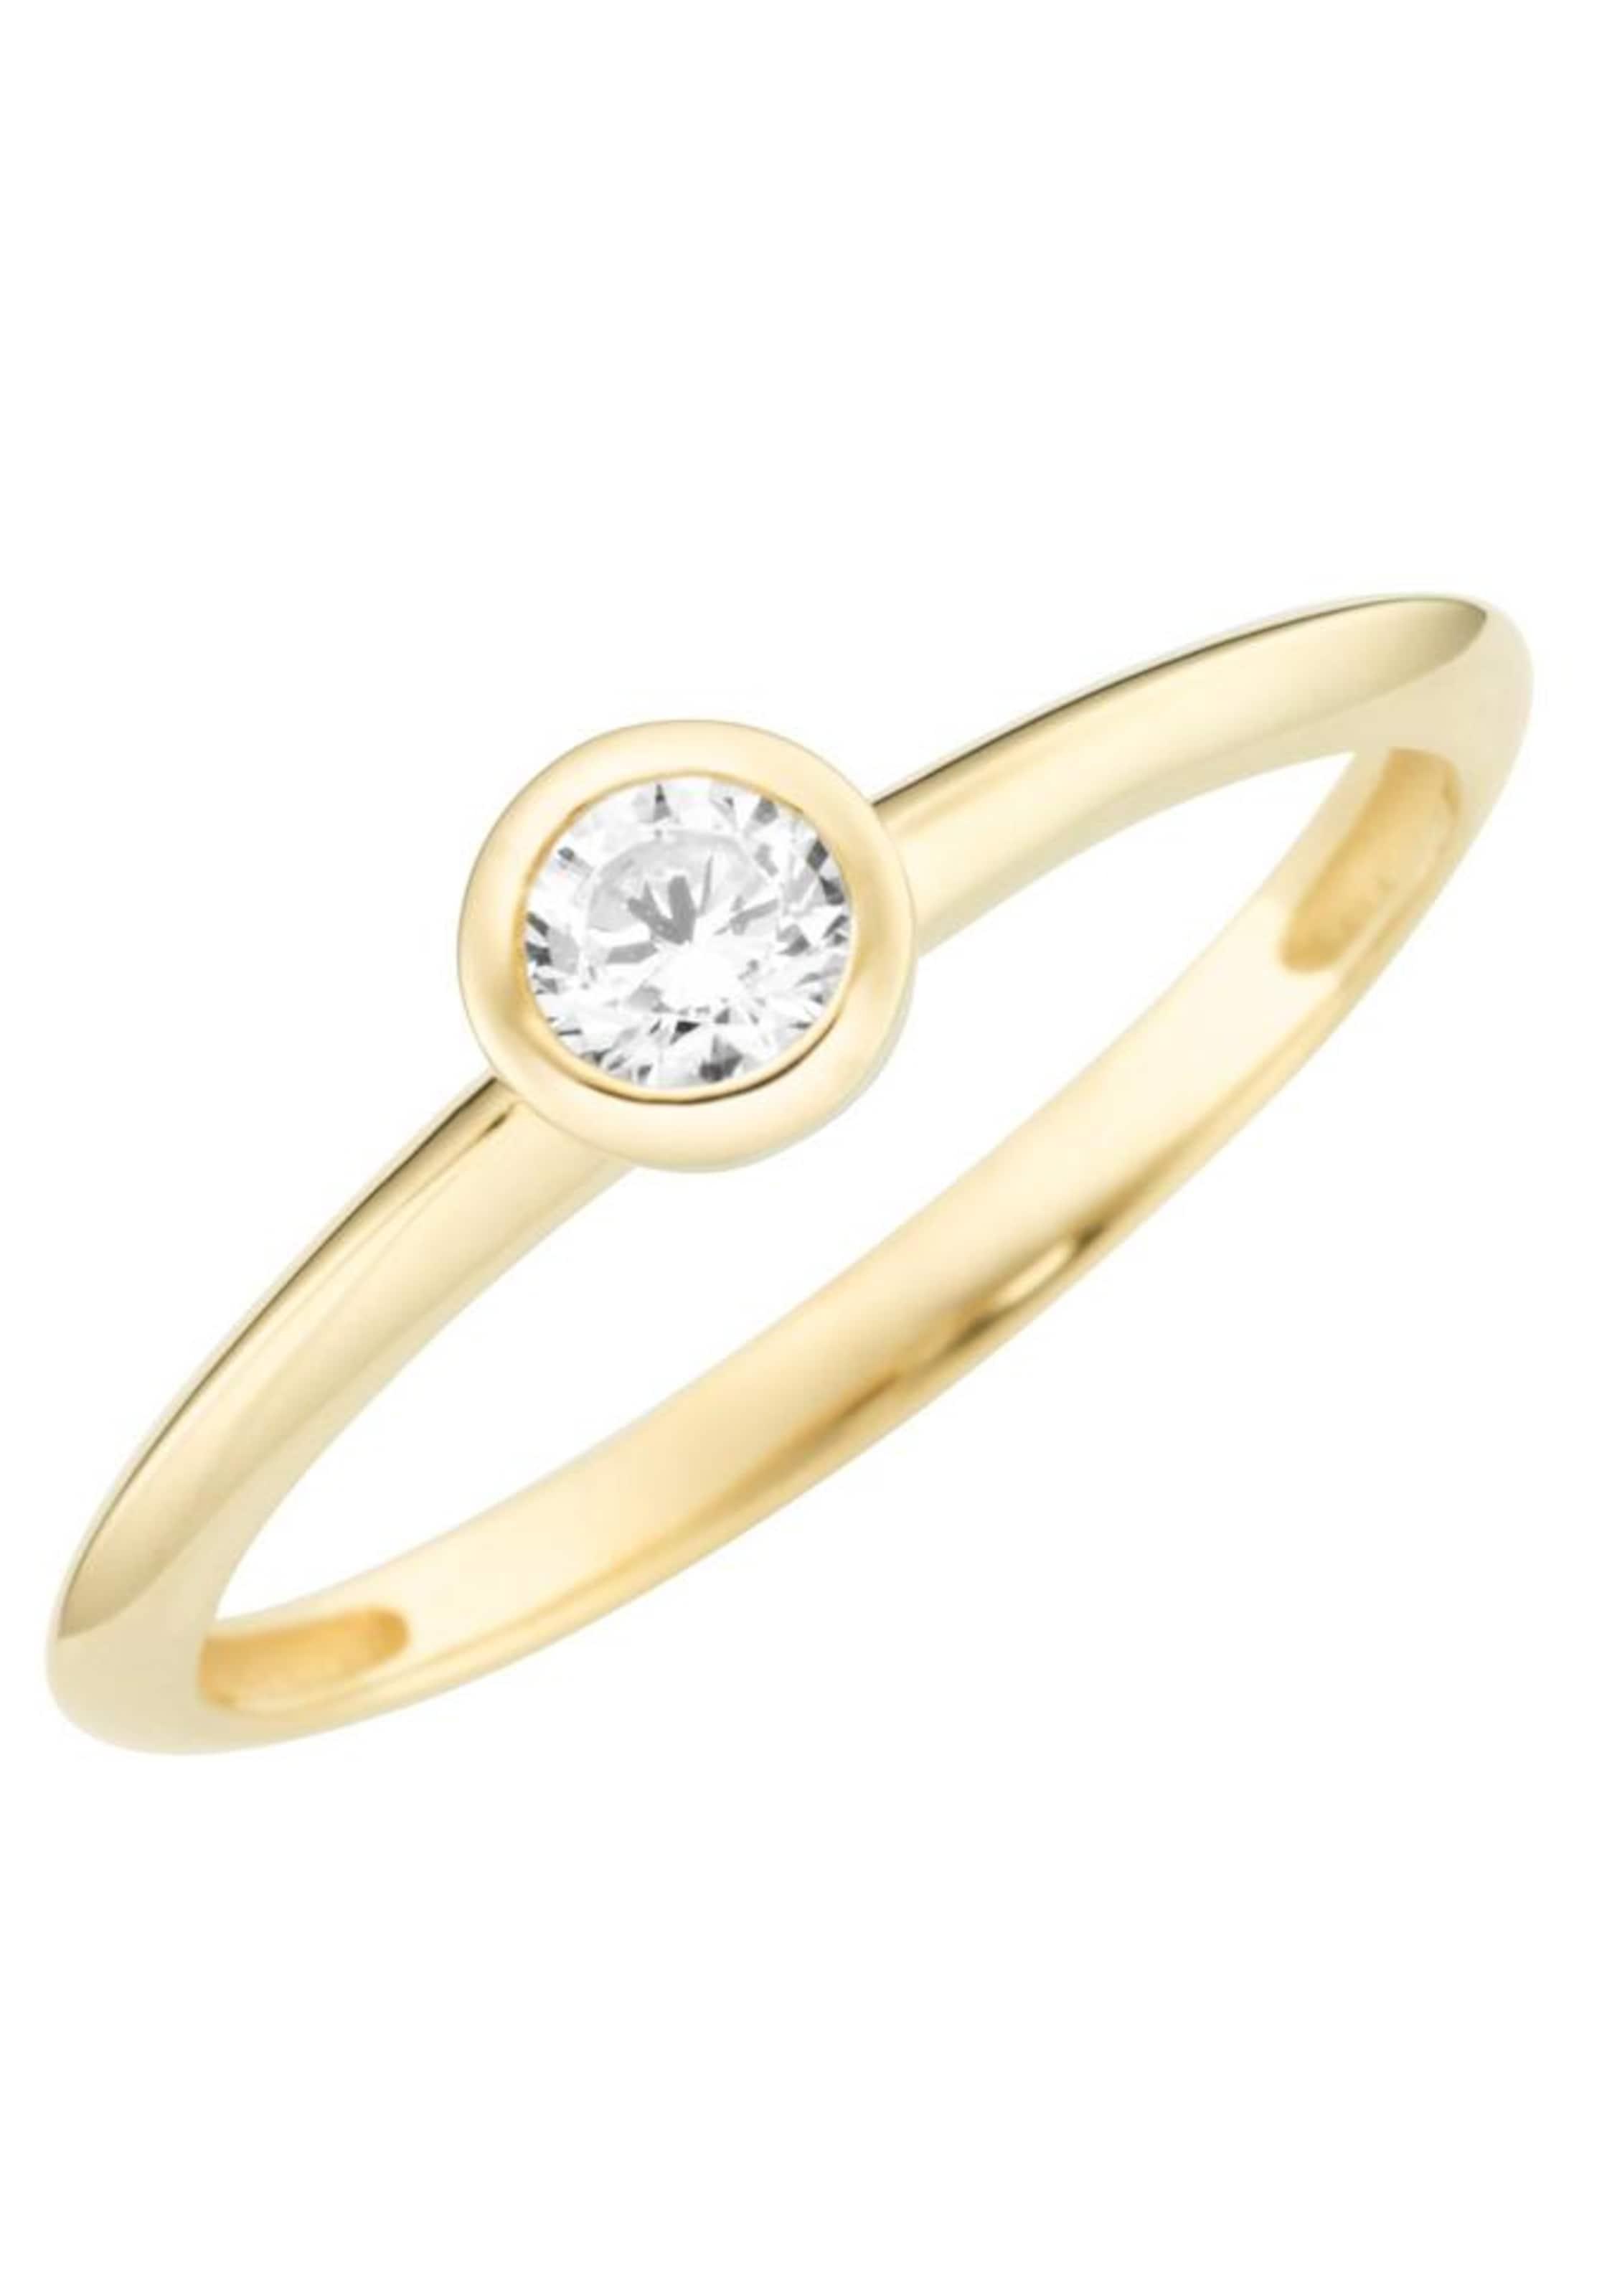 Ring Ring Firetti In Firetti Firetti Ring Gold In In Gold dCBoxer